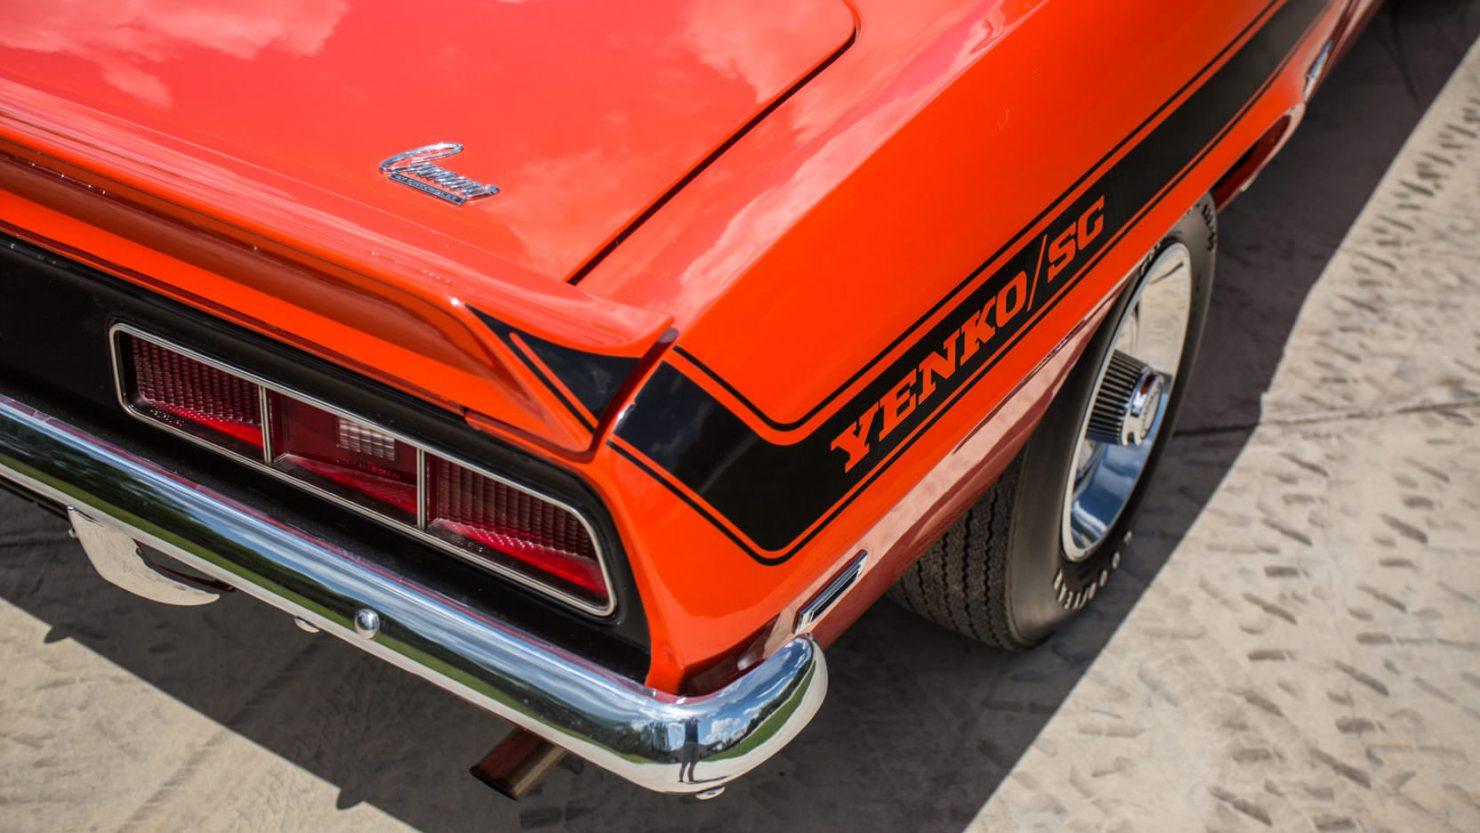 Chevrolet Yenko Camaro 4 1480x833 - 1969 Chevrolet Yenko Camaro